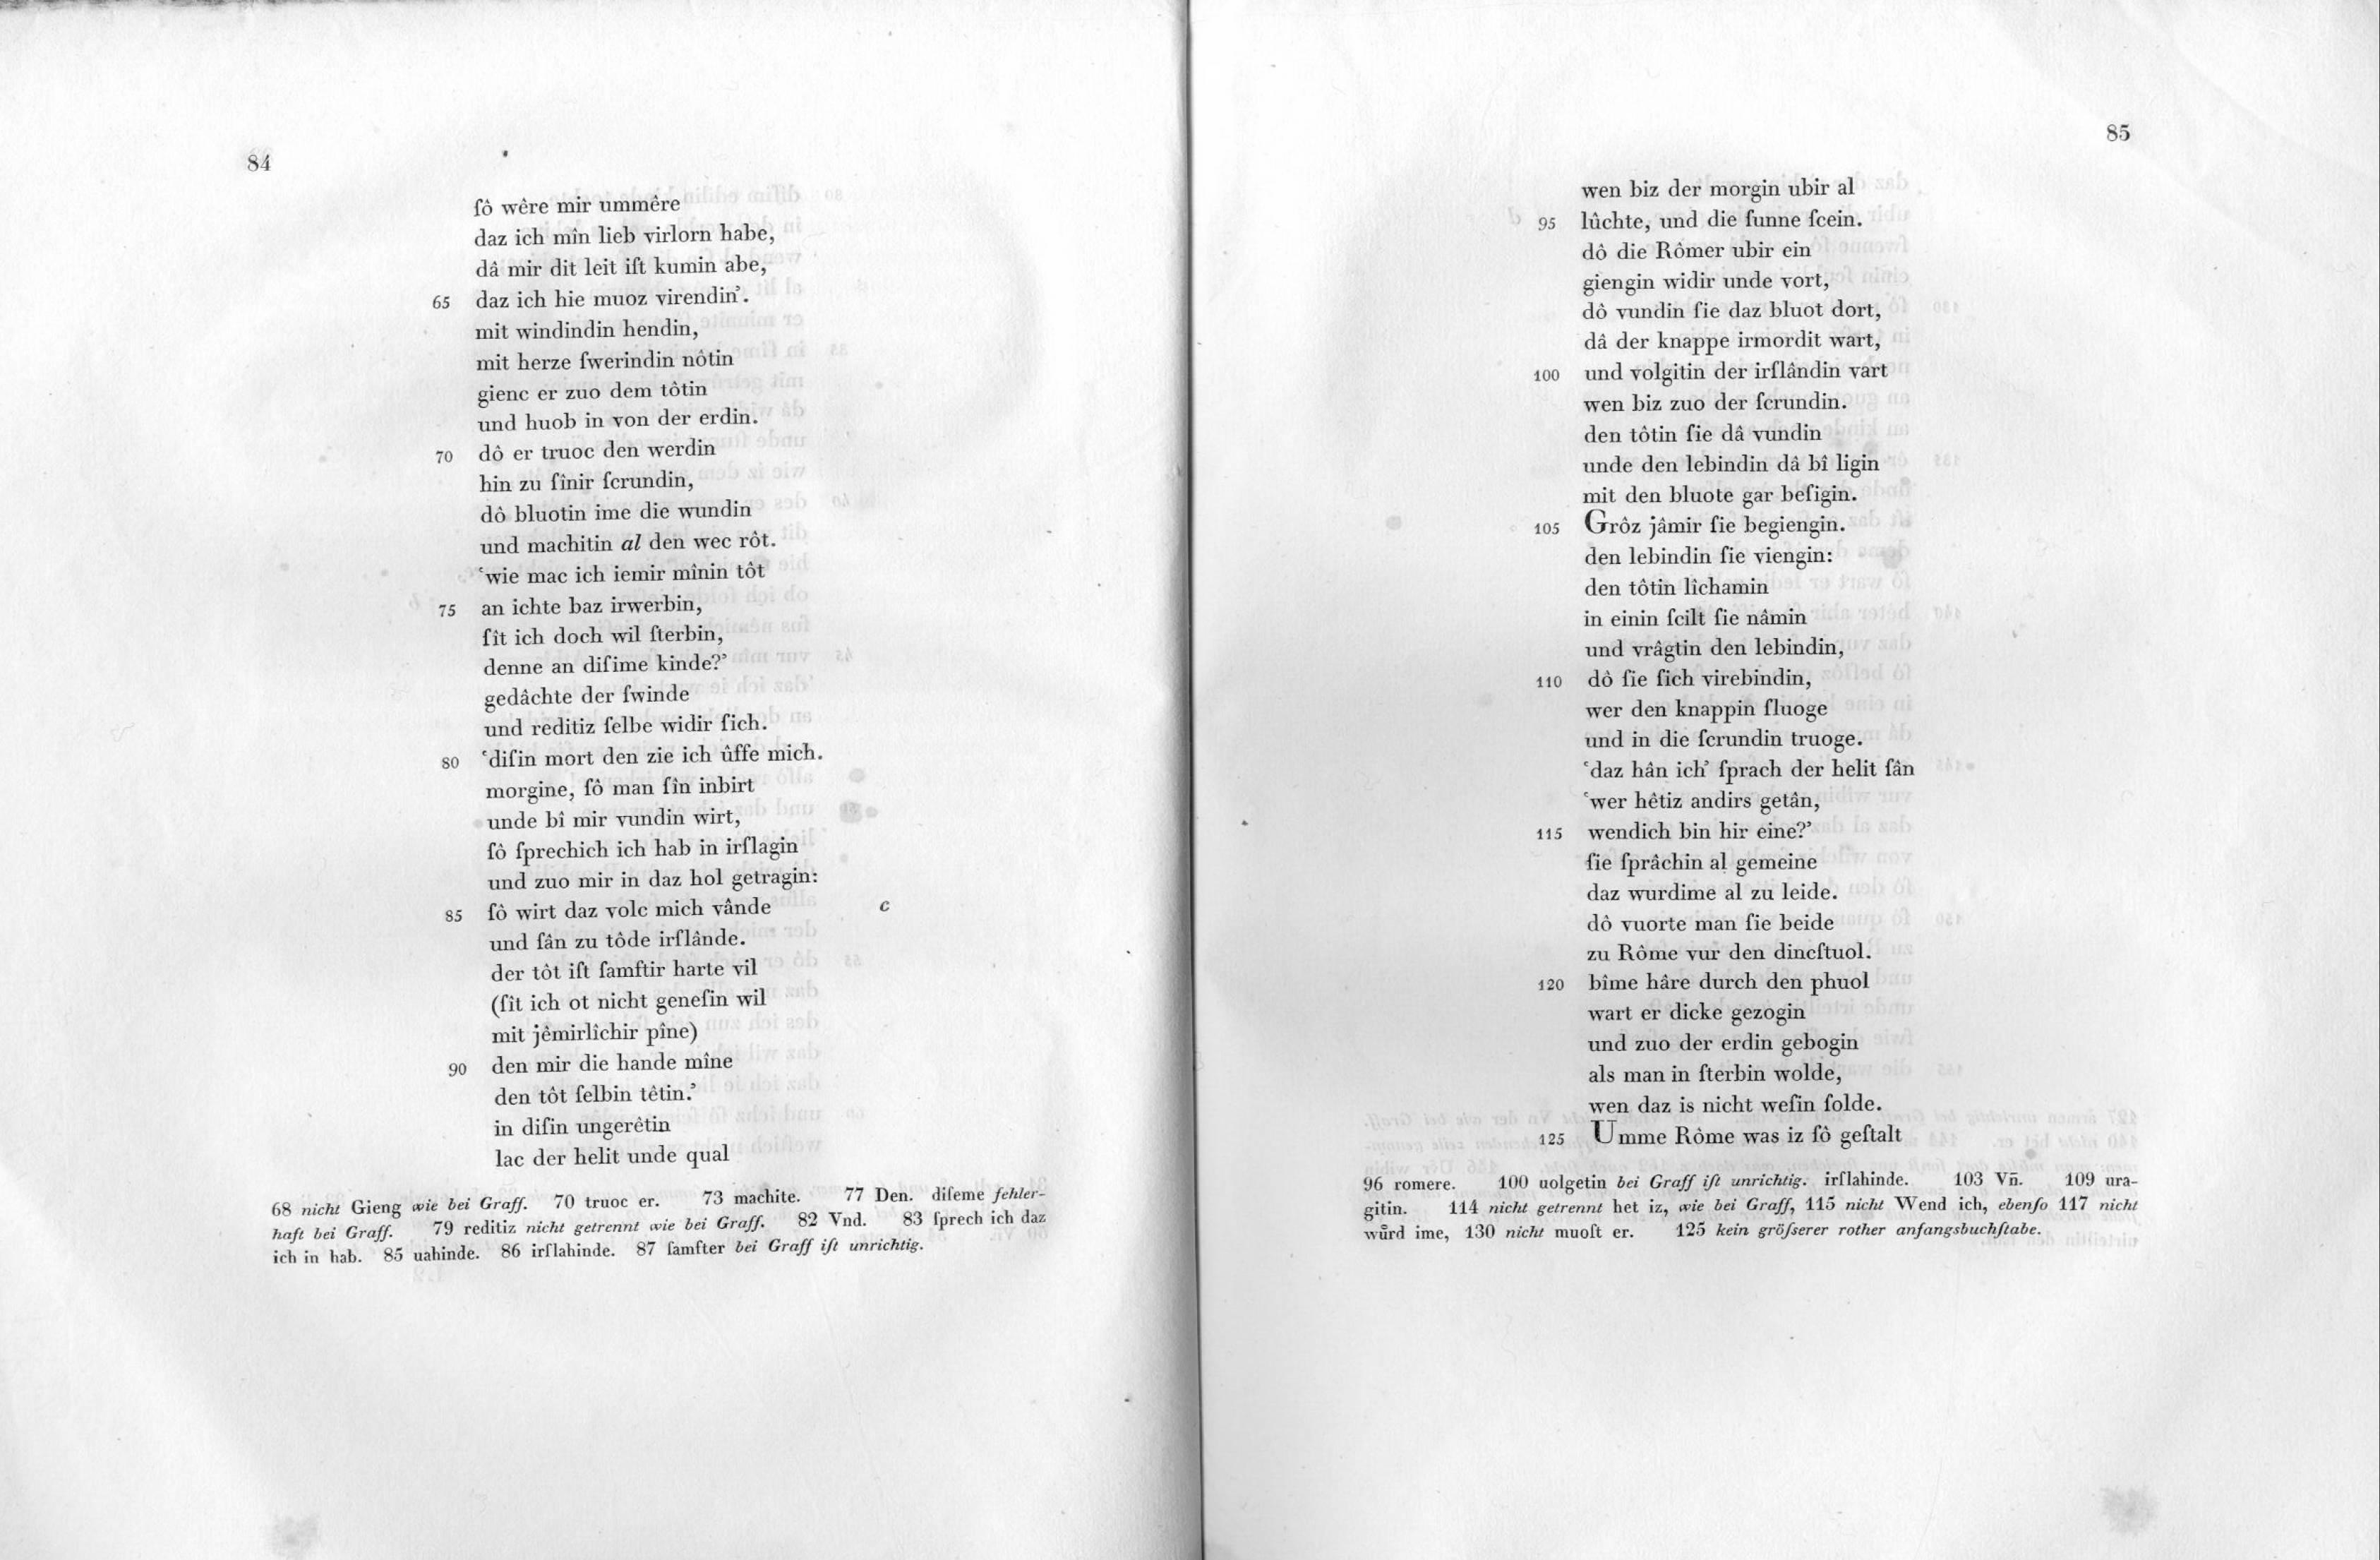 File:De Athis und Prophilias (Grimm W.) 043.jpg - Wikimedia Commons